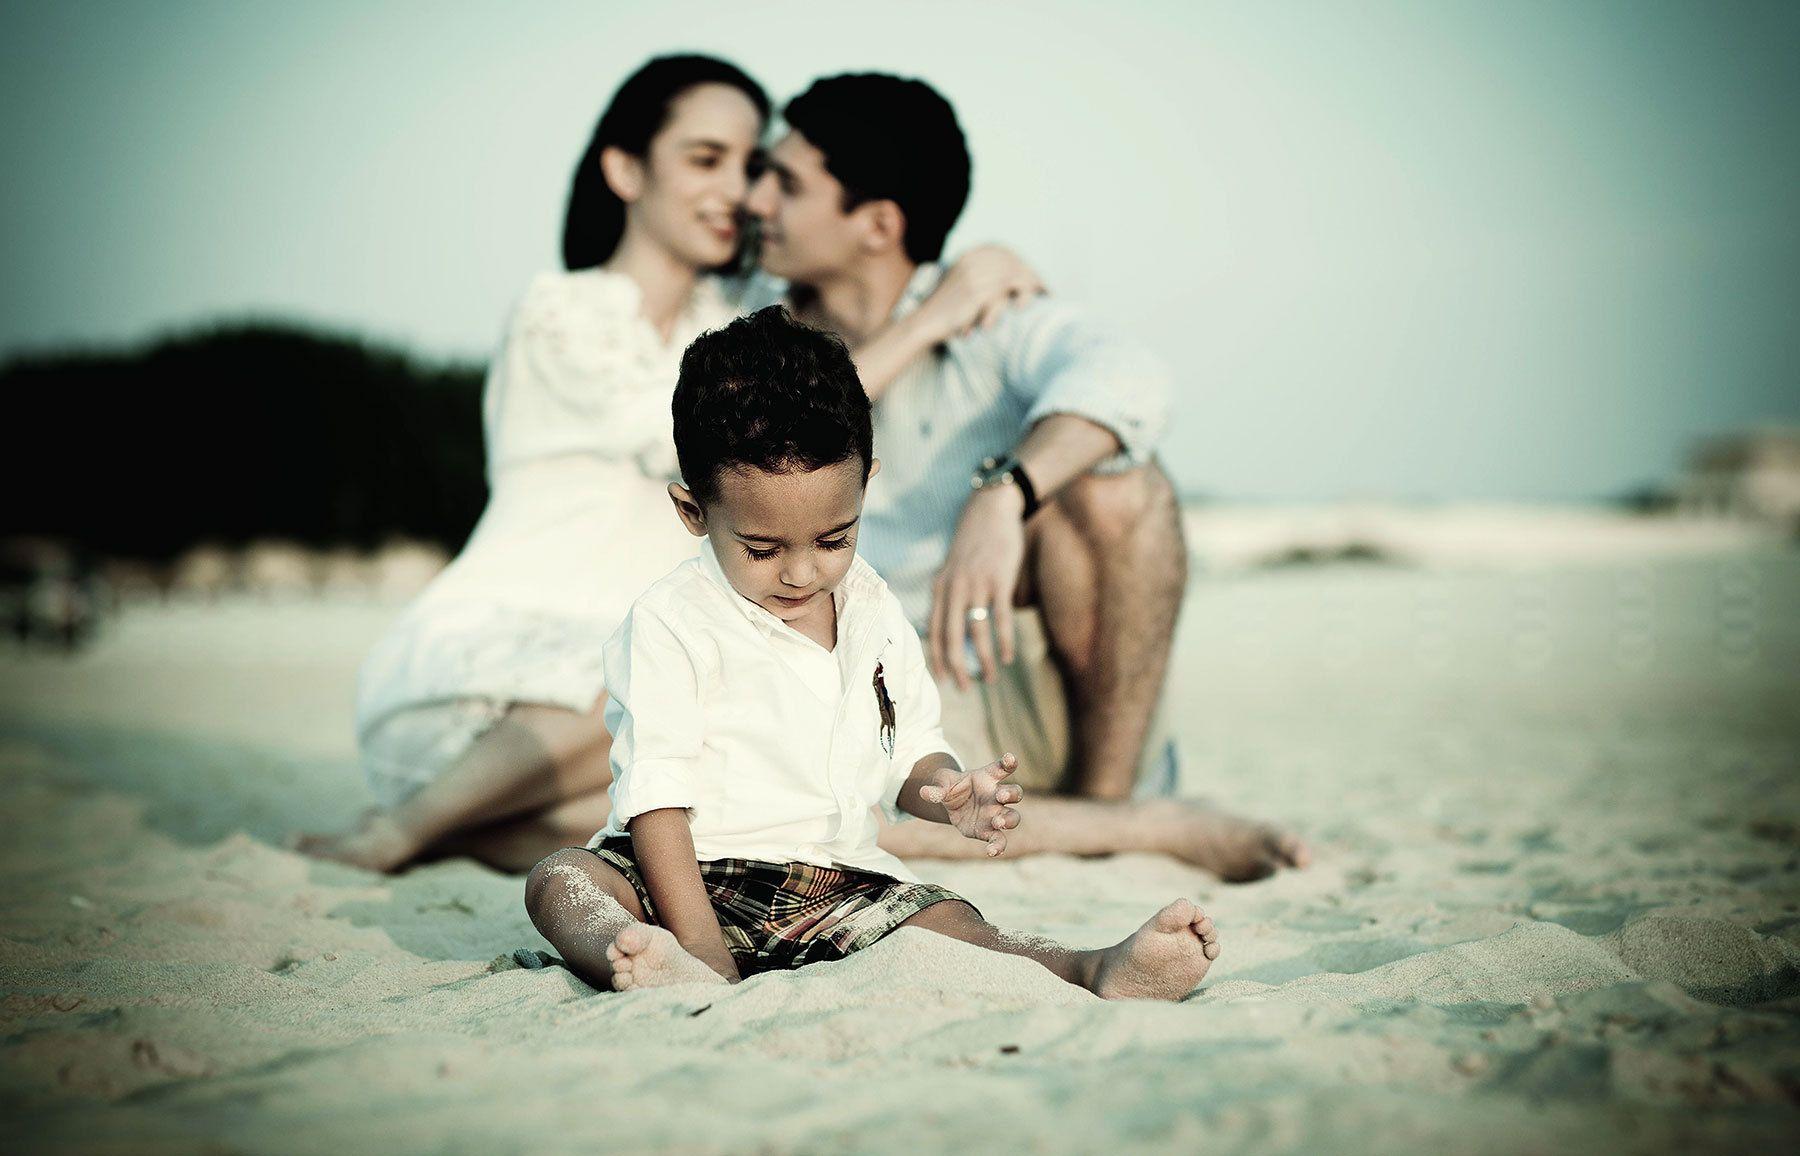 Family Portraits Photography in Dubai